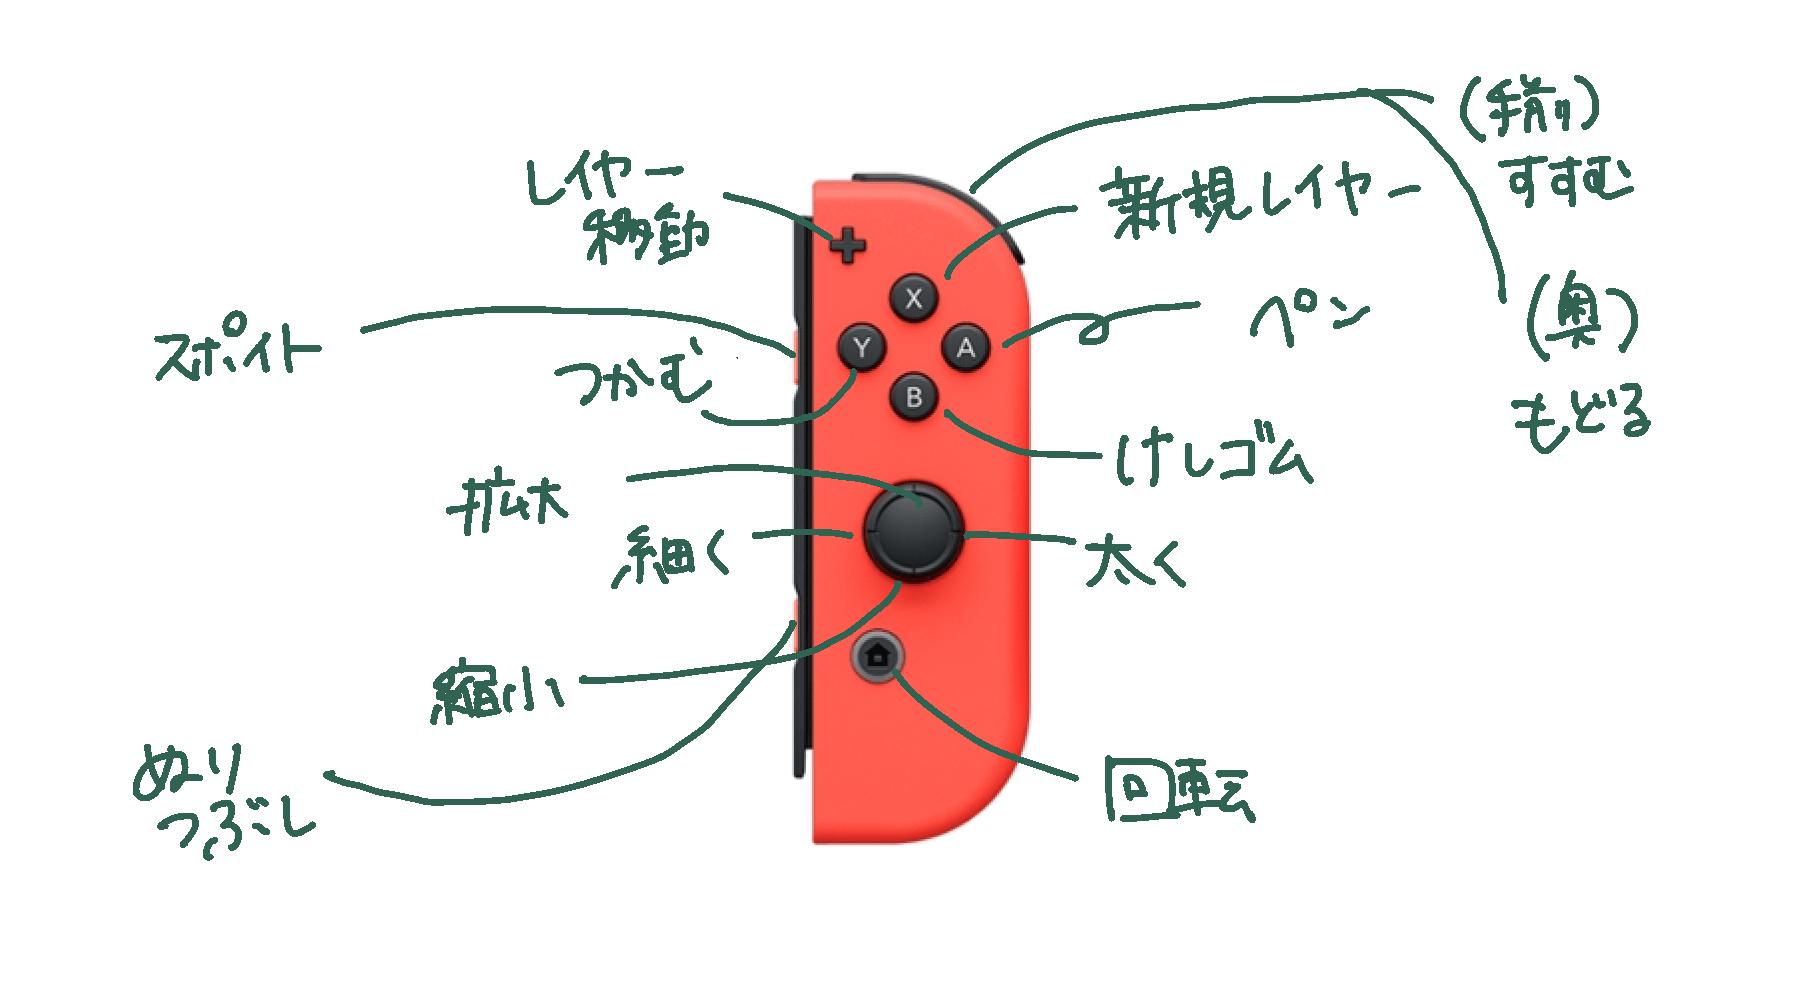 Macclipstudioに任天堂スイッチのジョイコンを導入する方法